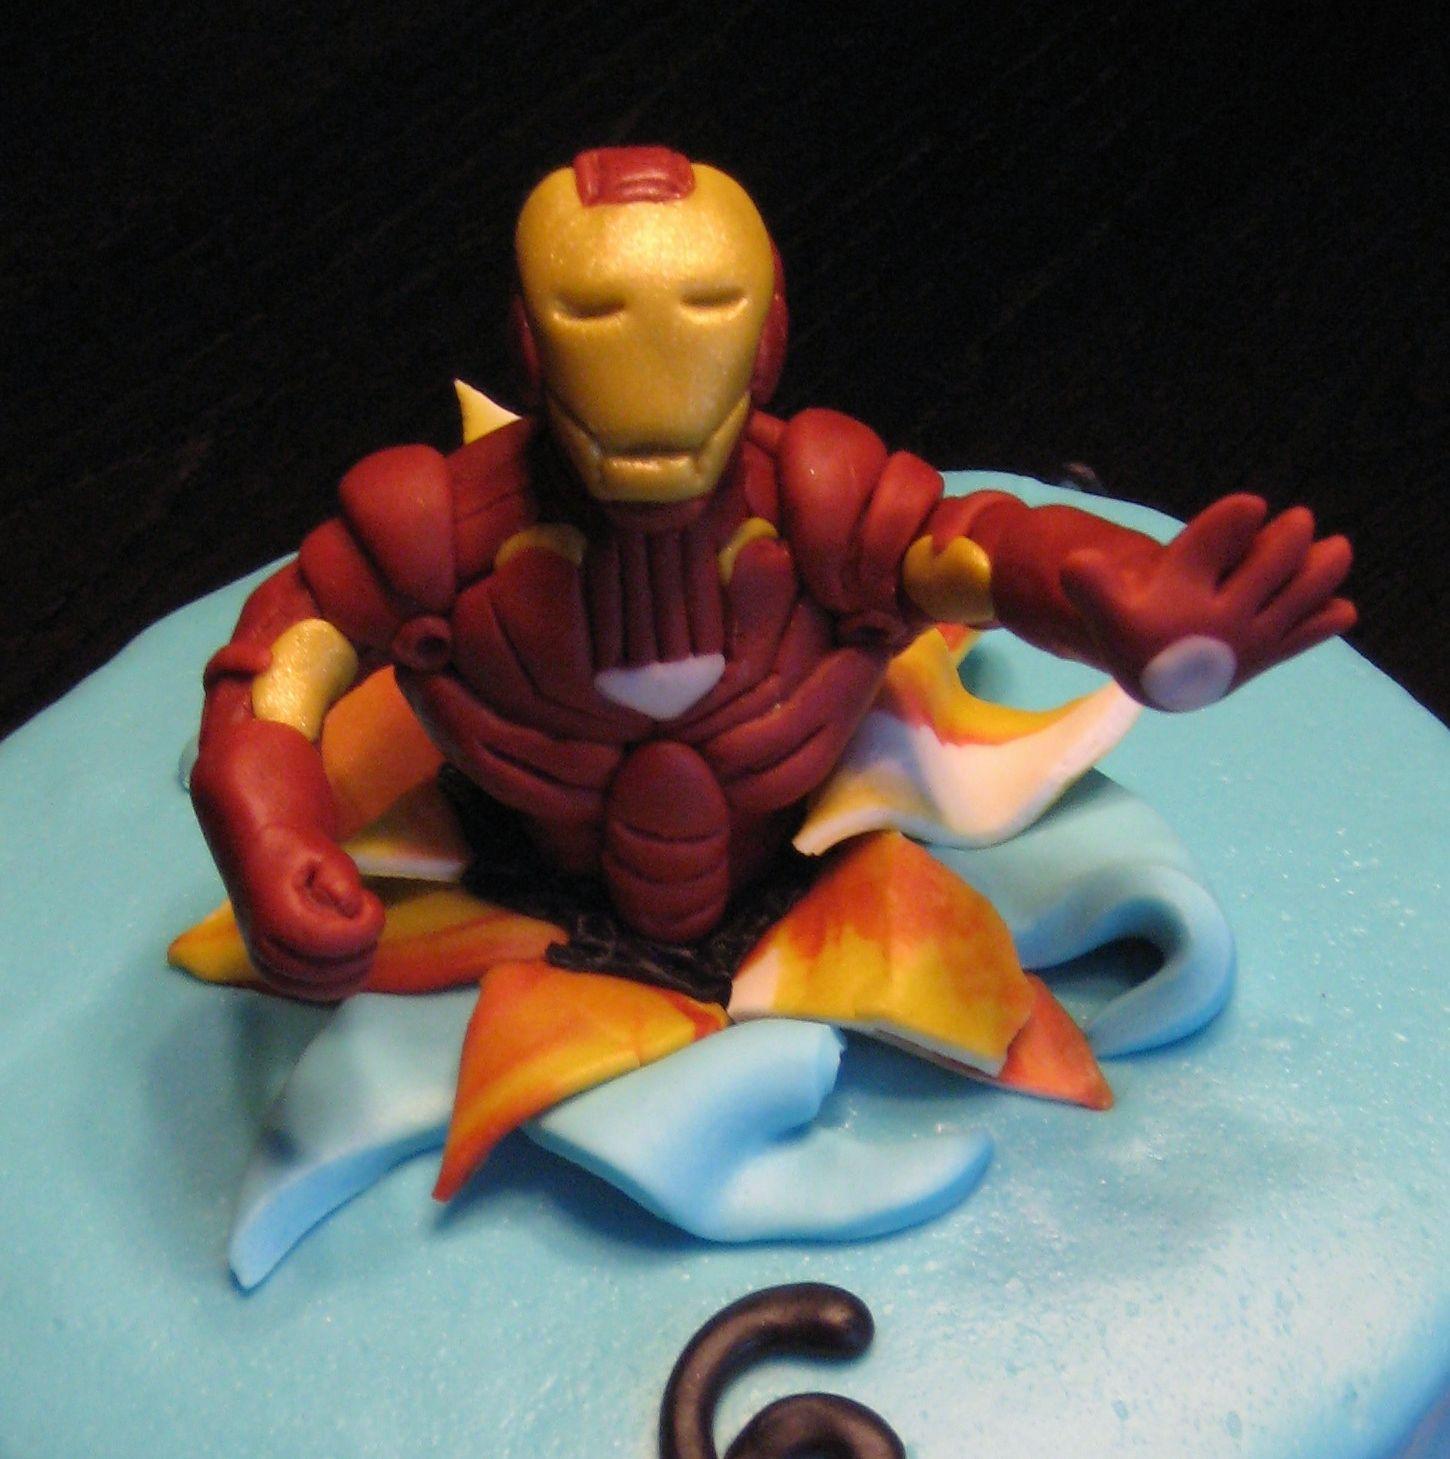 Iron Man Cake Make cake decoration and cake baking easy with these